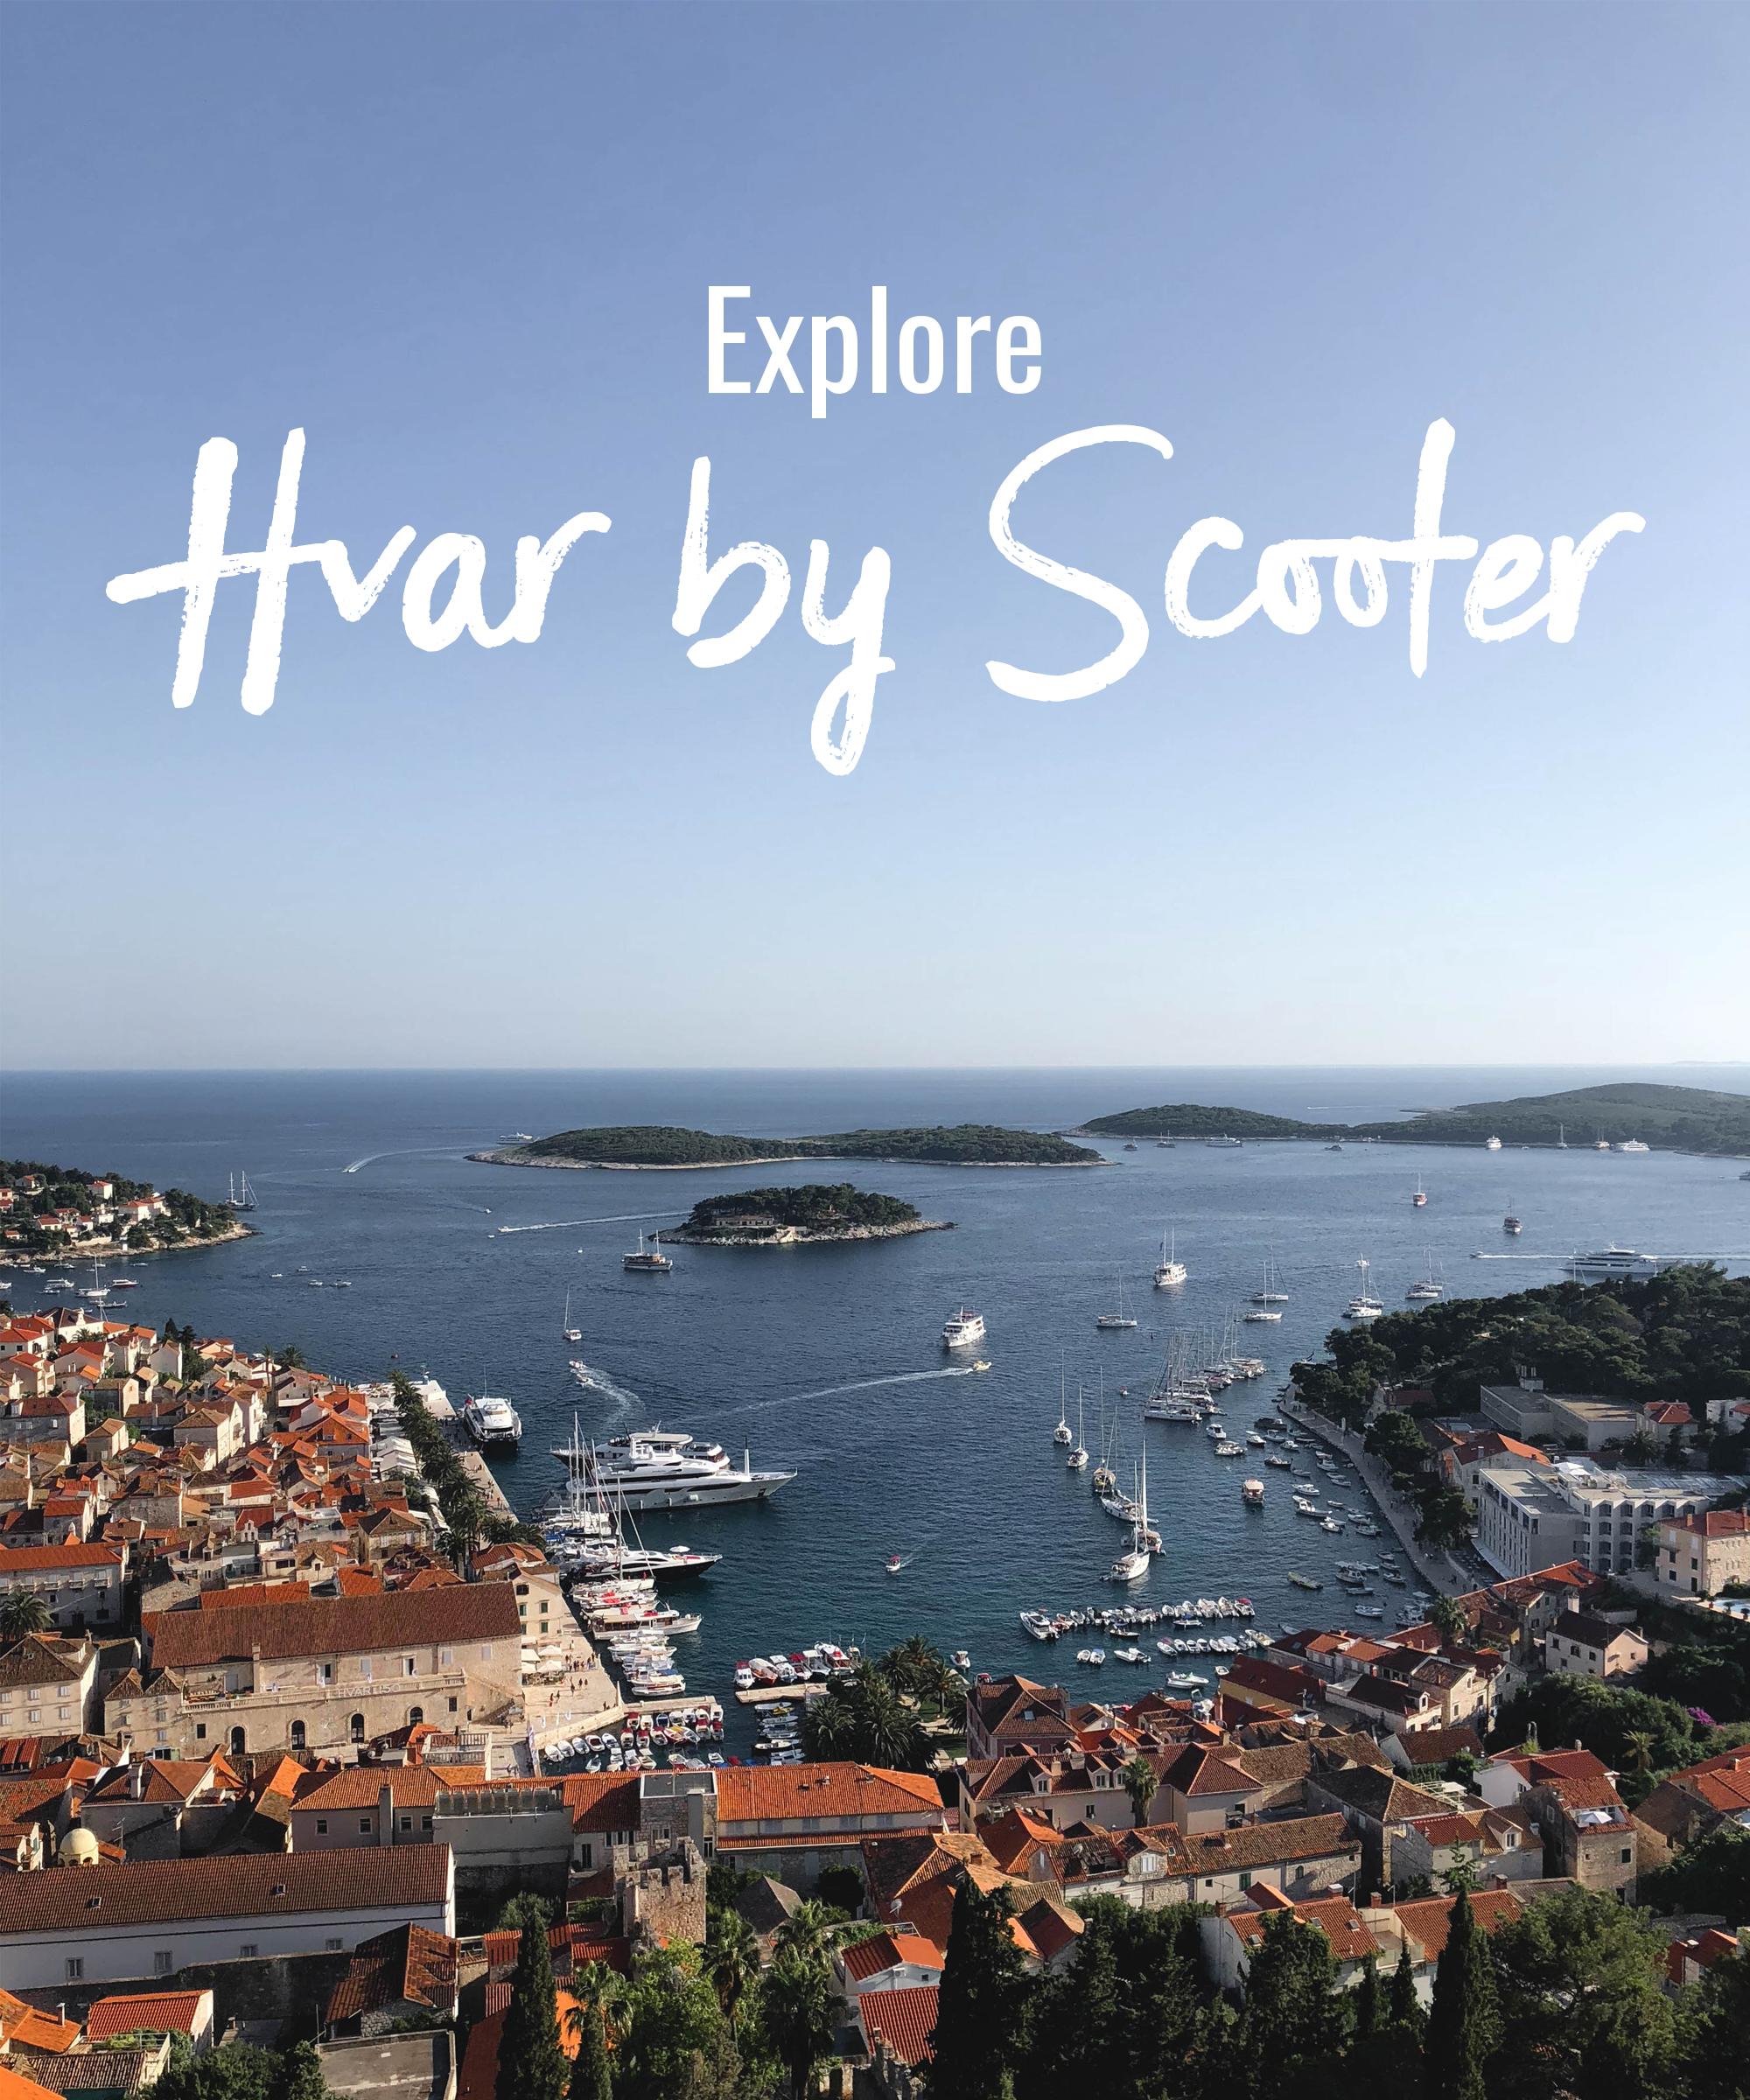 Explore Hvar by Scooter